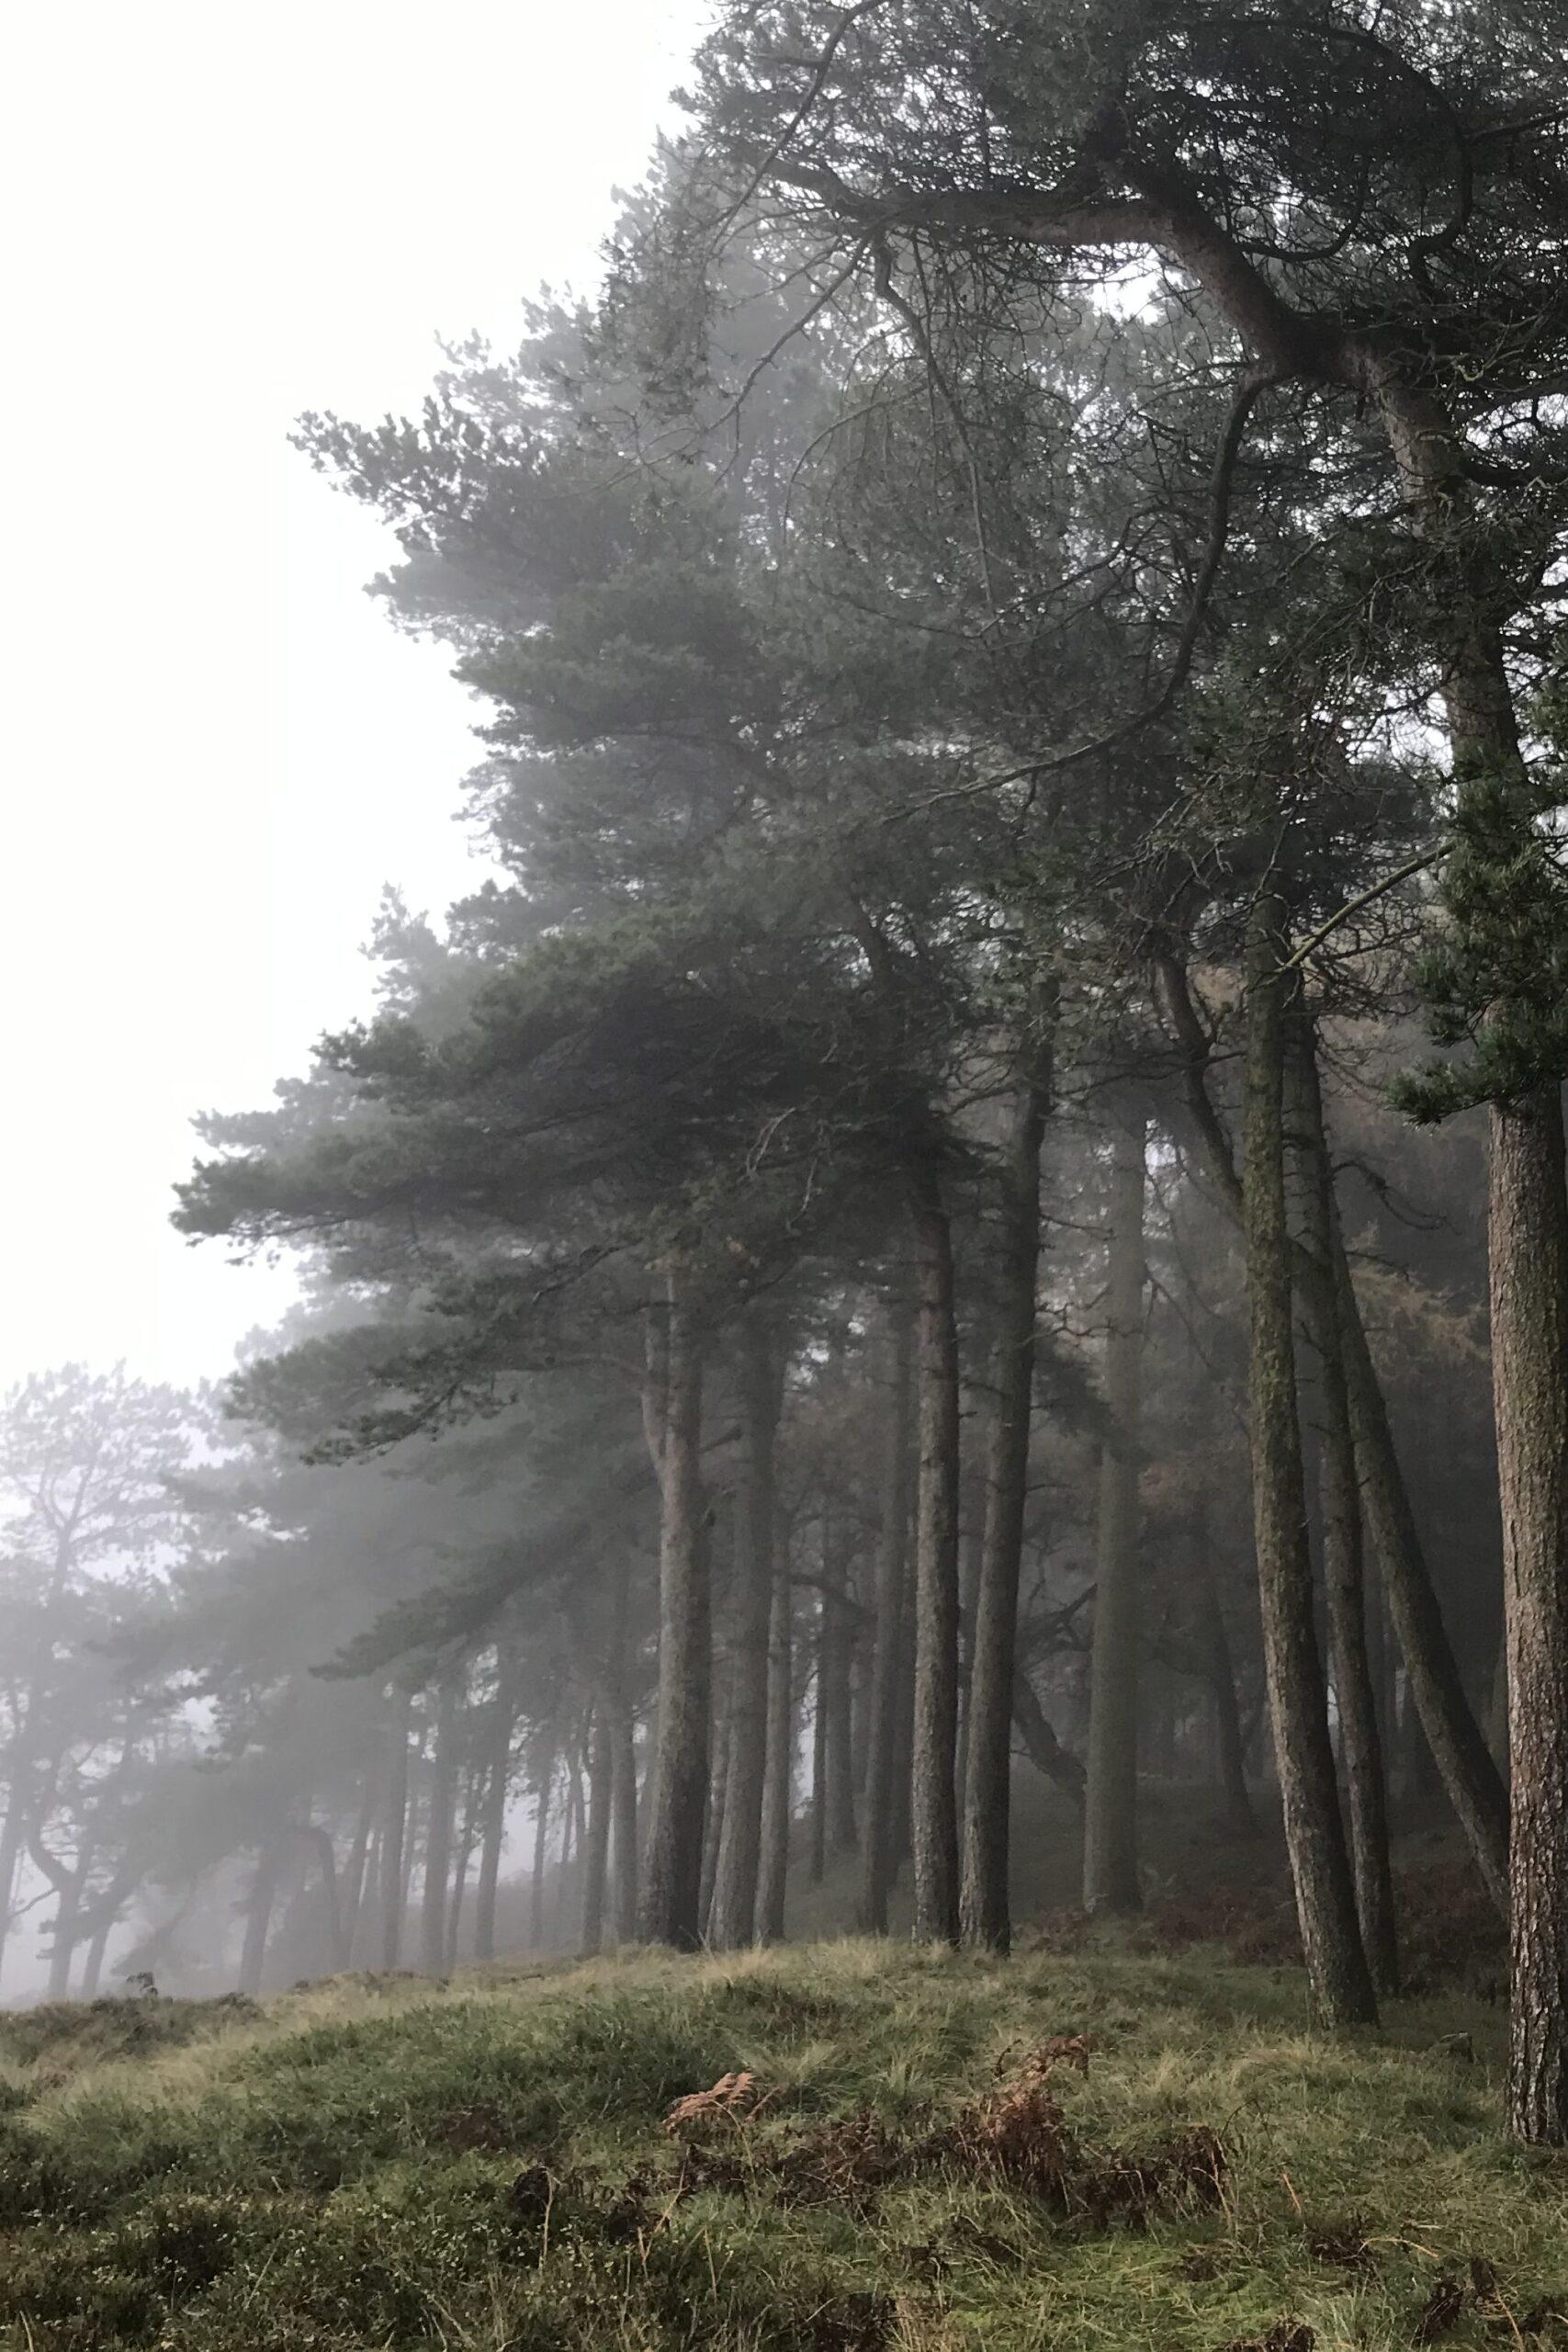 Misty Ilkley moor